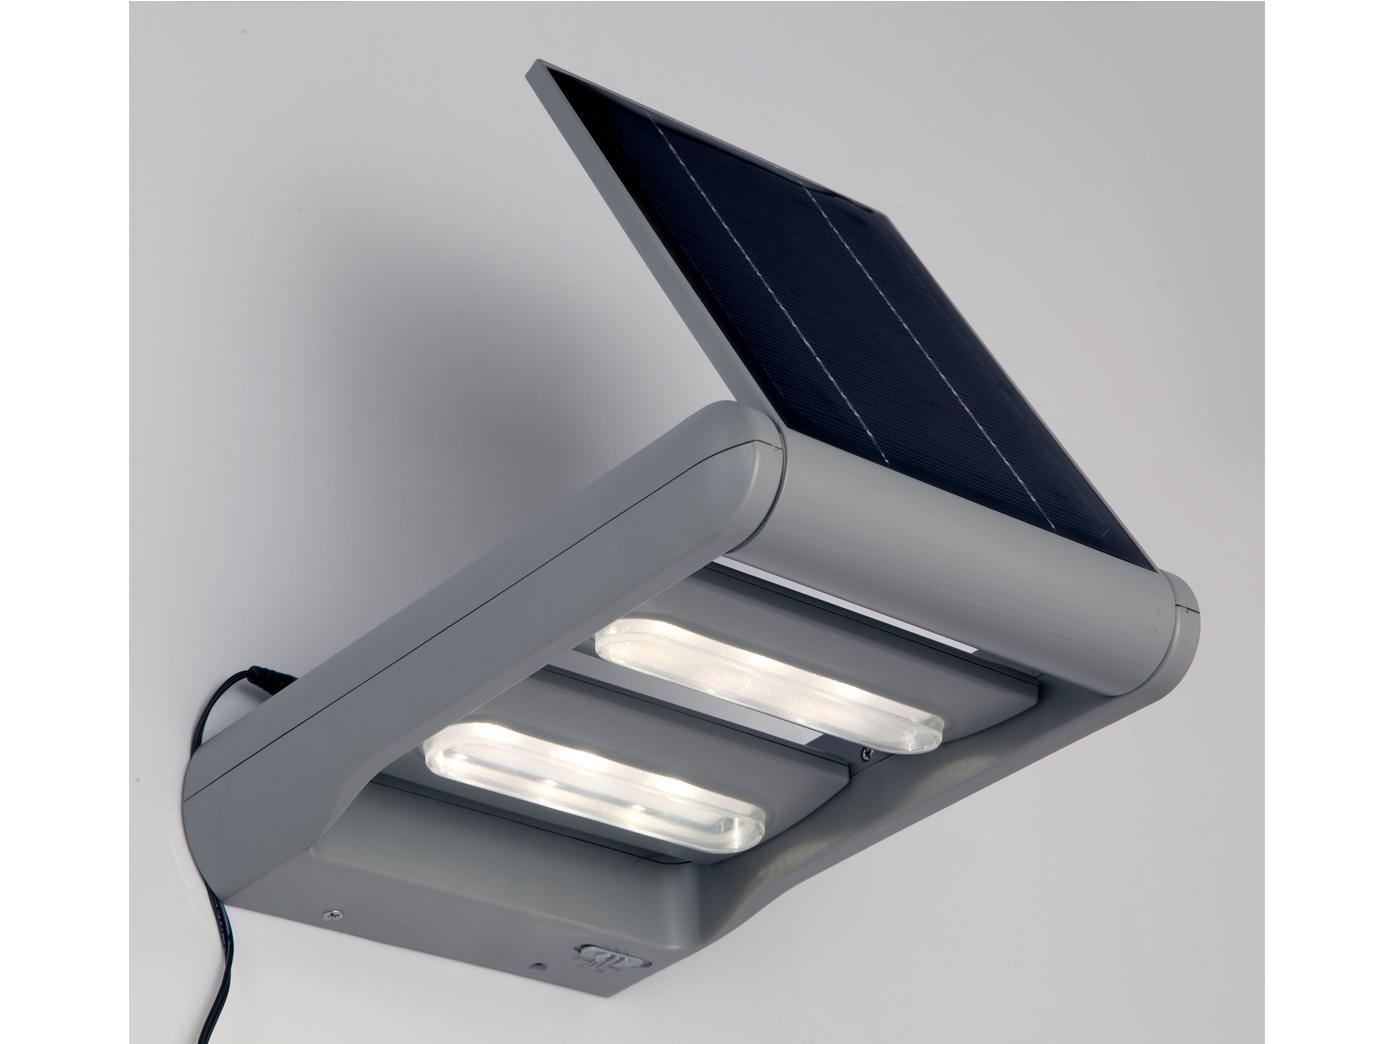 2 fl design led solarleuchte dimmbar drehbar ip44 wandlampen au enleuchten ebay. Black Bedroom Furniture Sets. Home Design Ideas